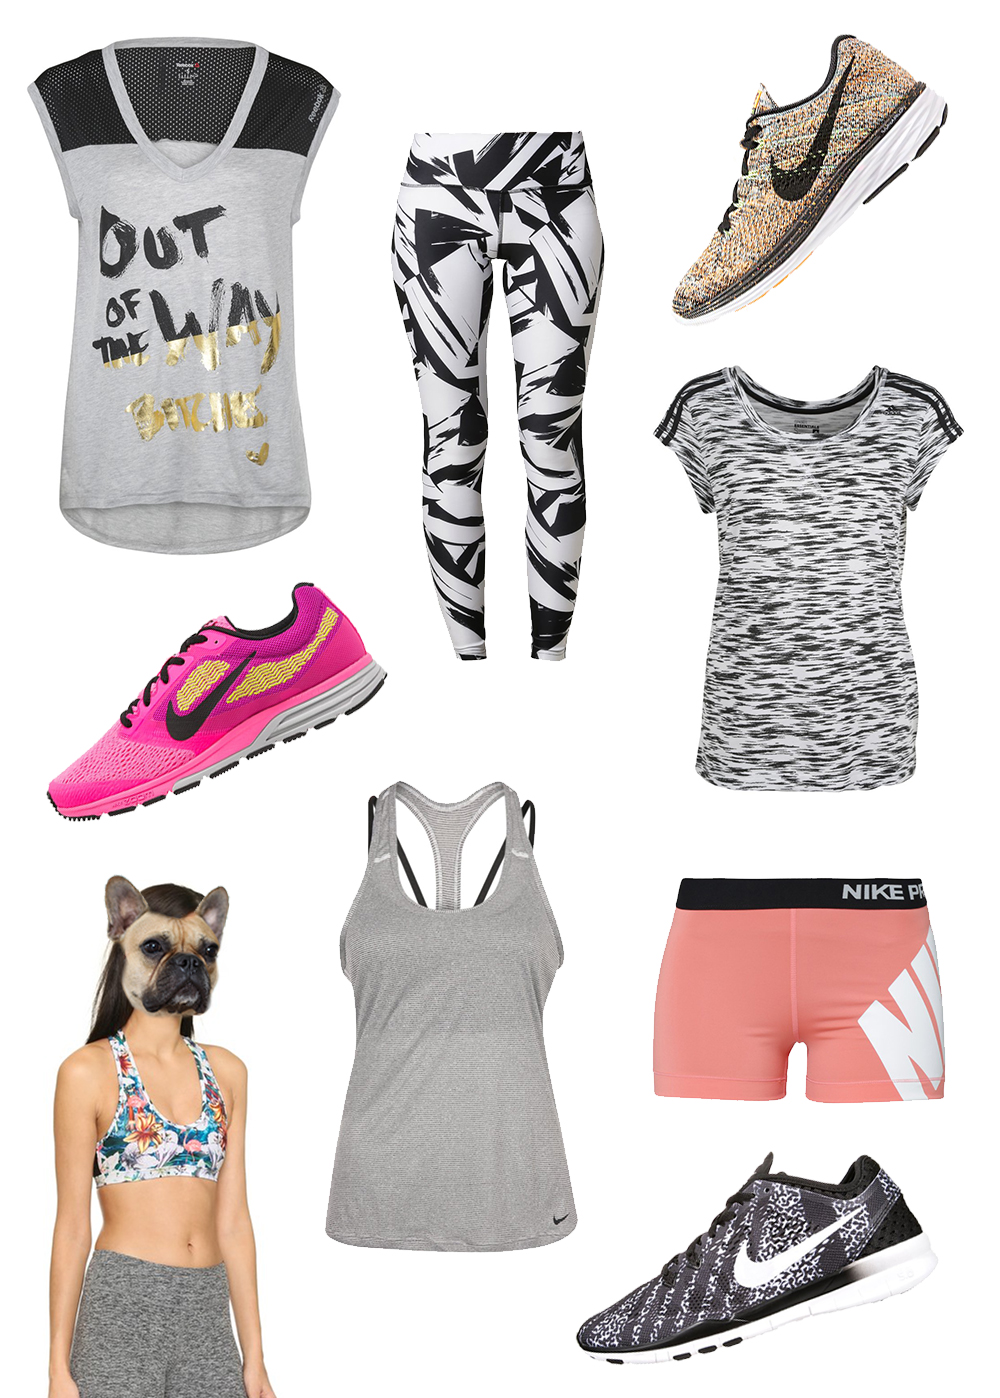 who is mocca, blog, tirol, tirolblog, innsbruck, sportblogger, fitnessblog, activewear, shopbop, sportklamotten, shopbop, zalando, whoismocca.com